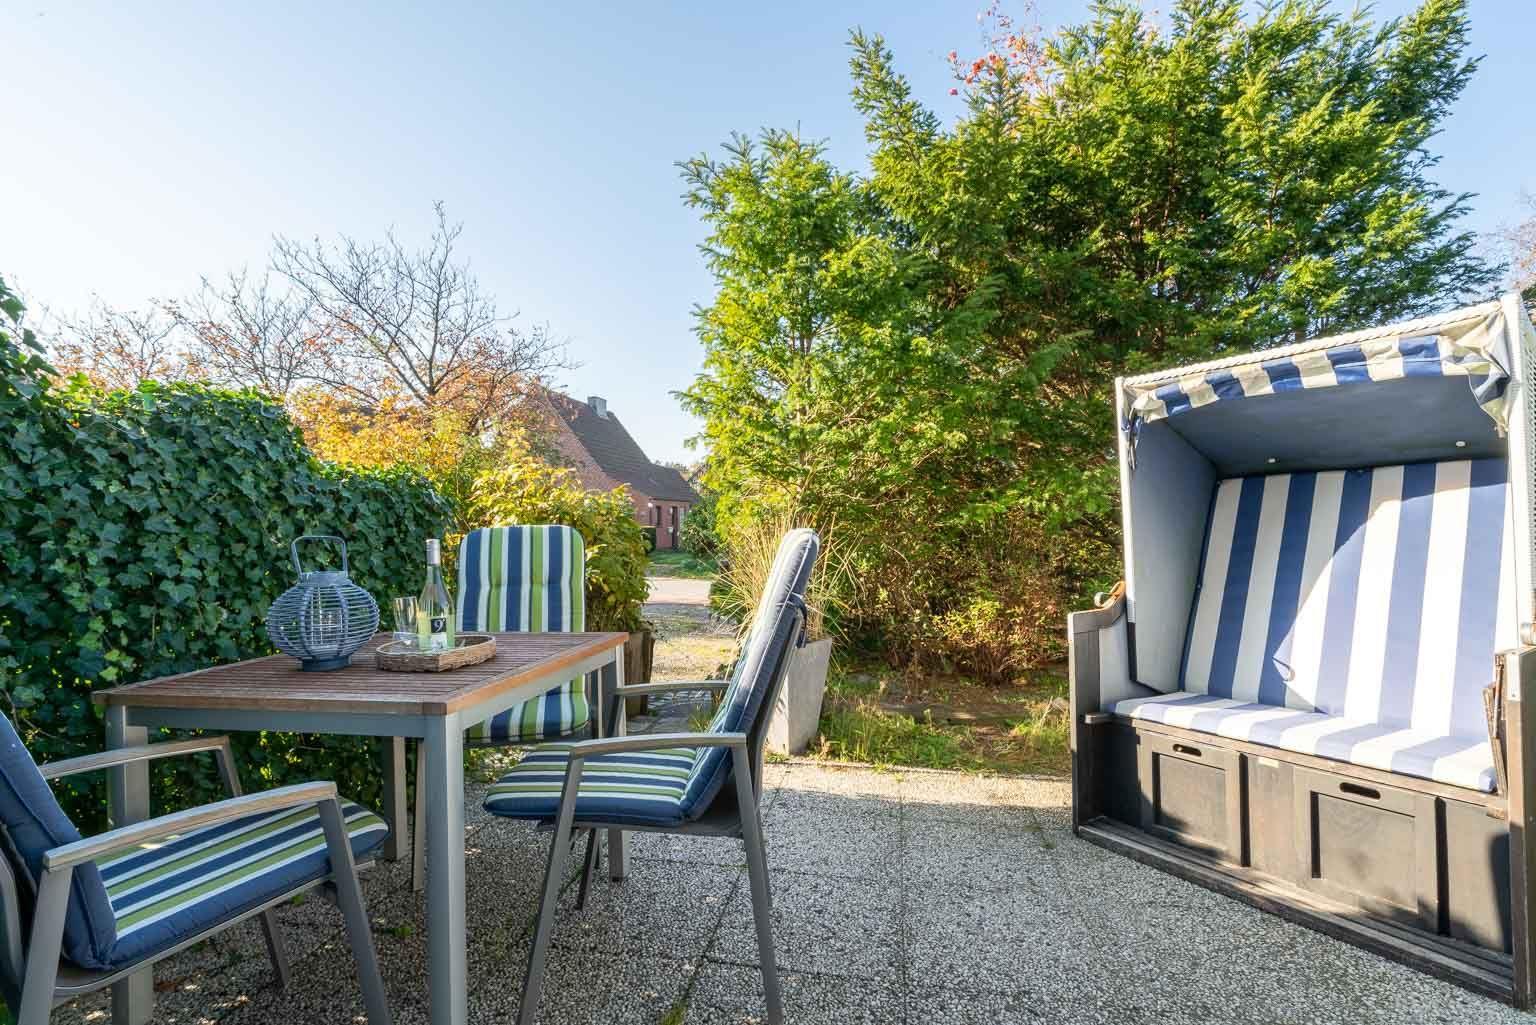 "Terrasse - St Peter Ording Dorf, Ferienhaus Groener Weg 9, Wohnung 1 ""Duenensonne EG"""